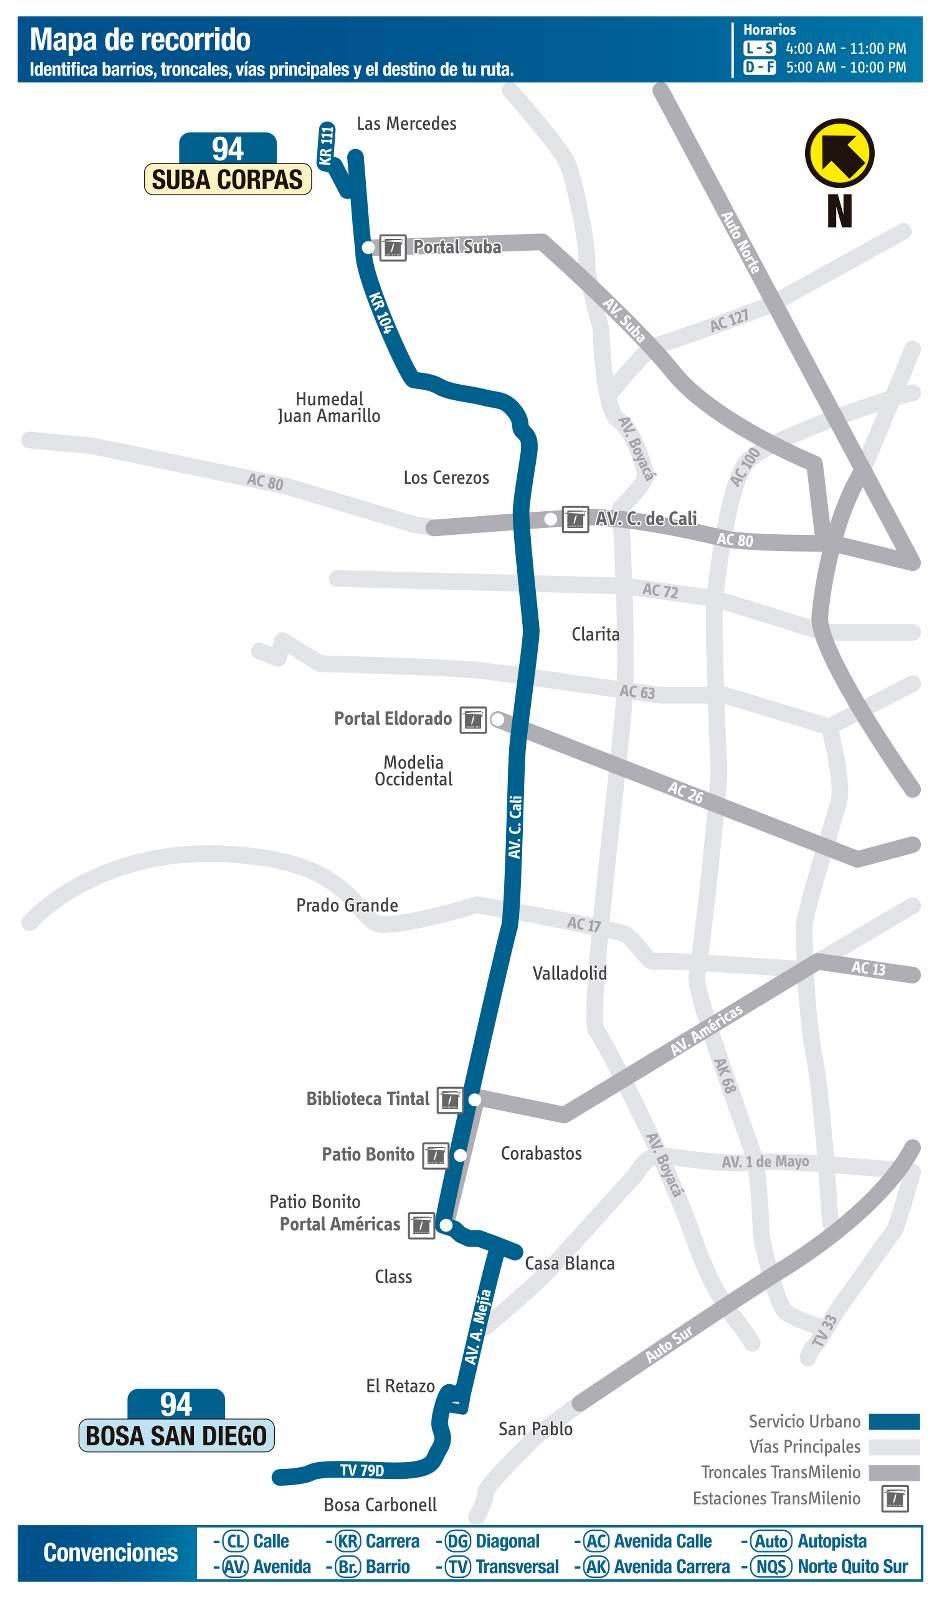 Ruta SITP: 94 Bosa San Diego - Suba Corpas (mapa)